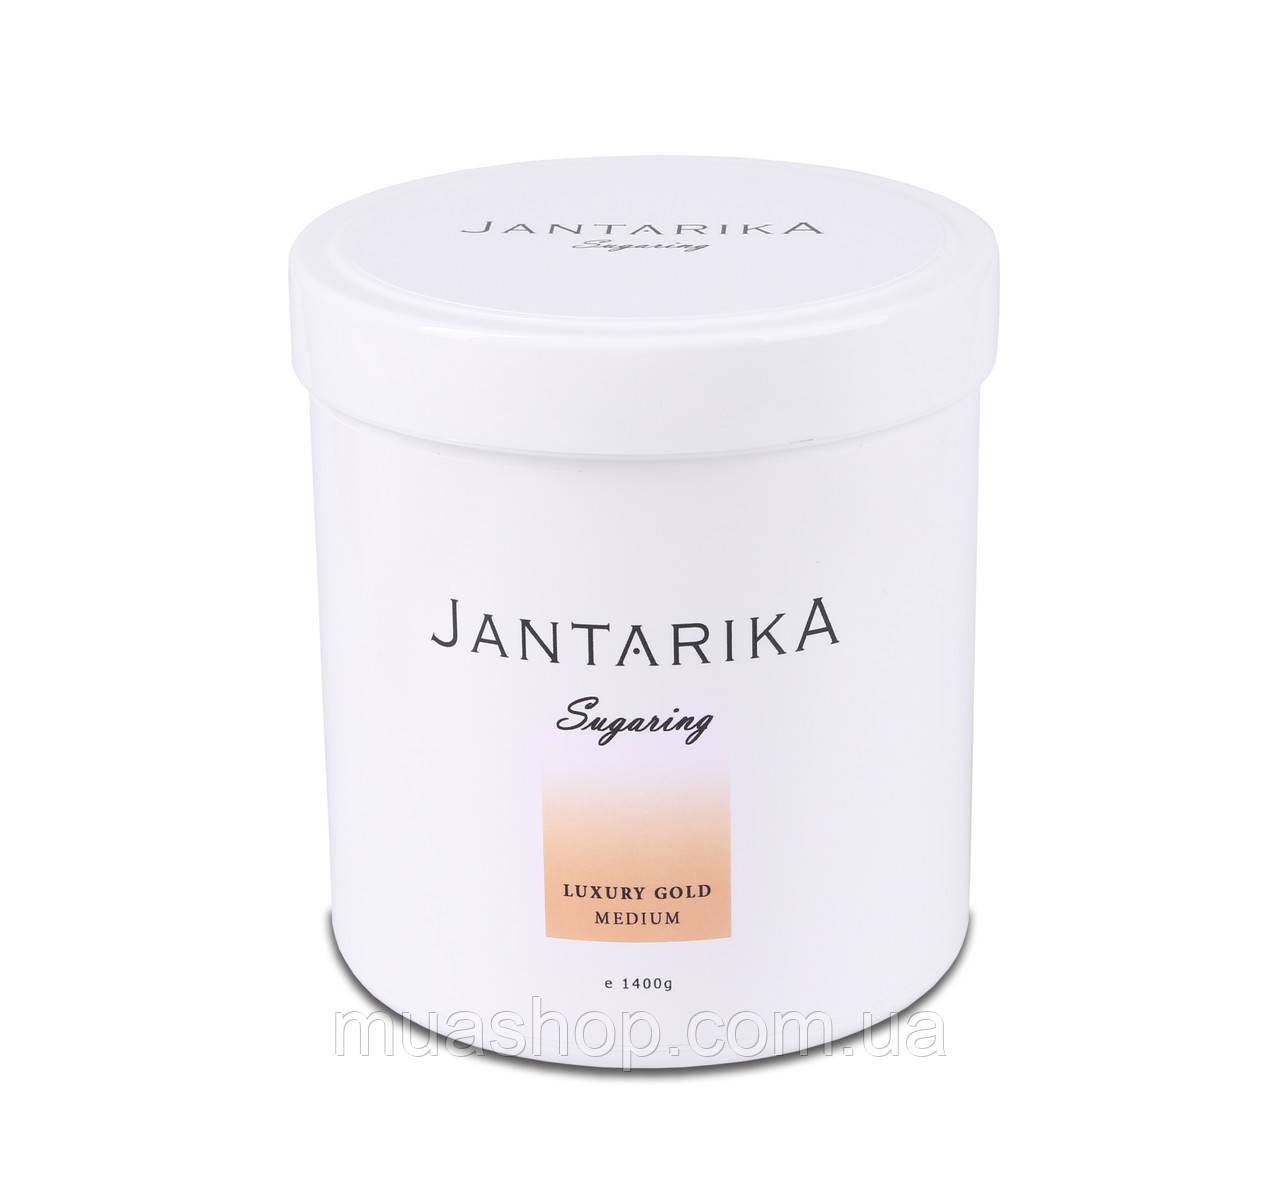 Сахарная паста JANTARIKА LUXURY Gold Medium (Средняя) 1,4 кг